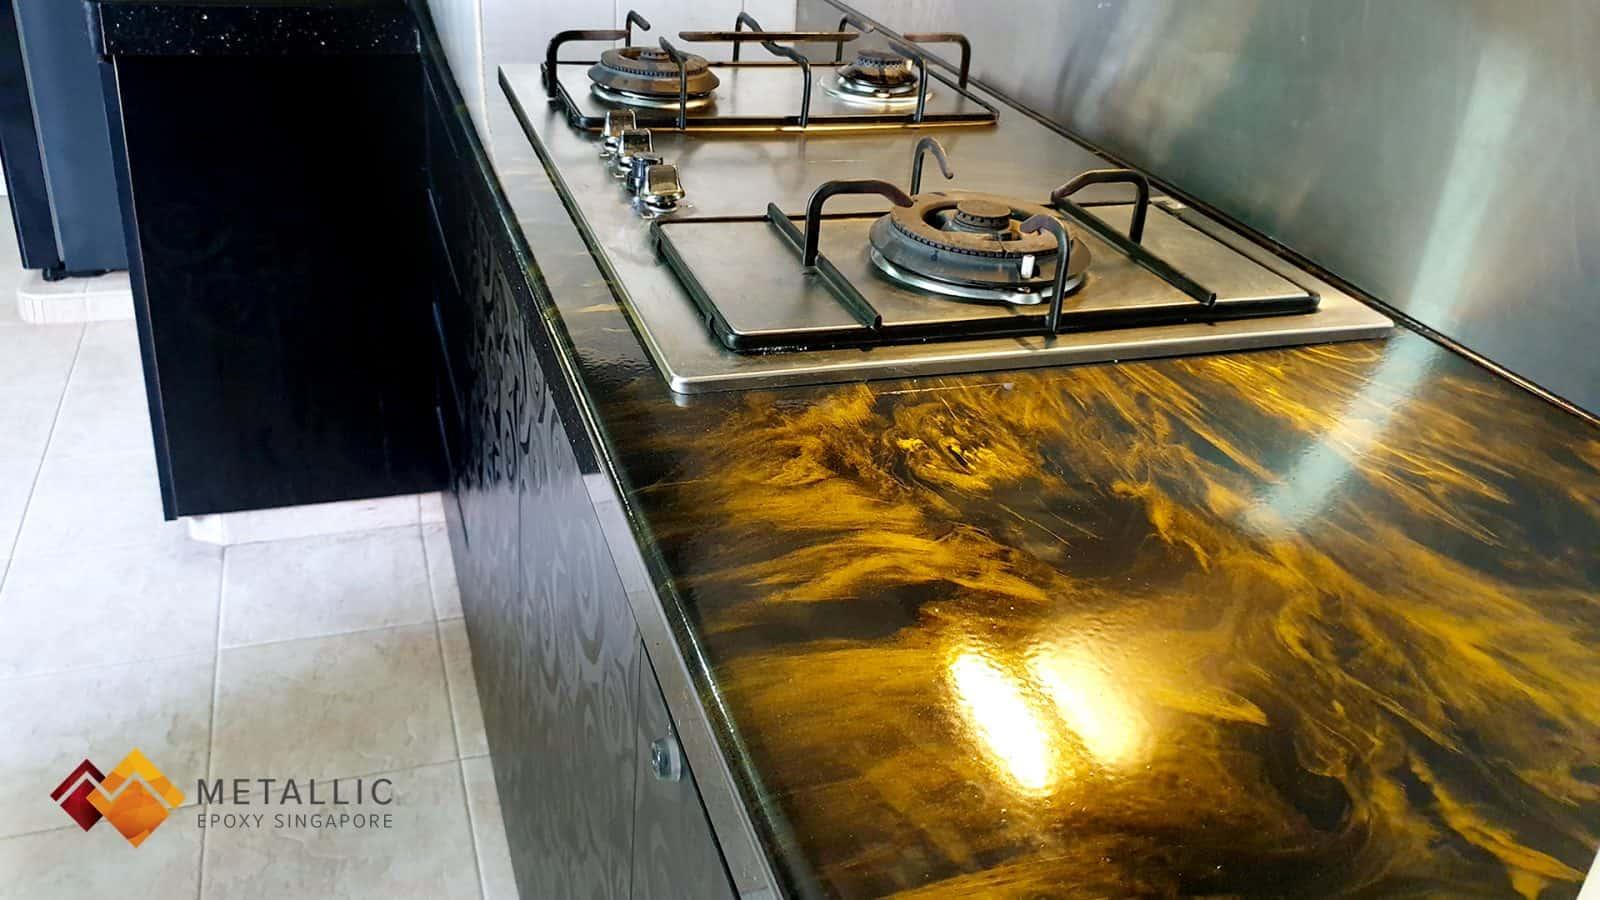 Metallic Orange Gold Countertop